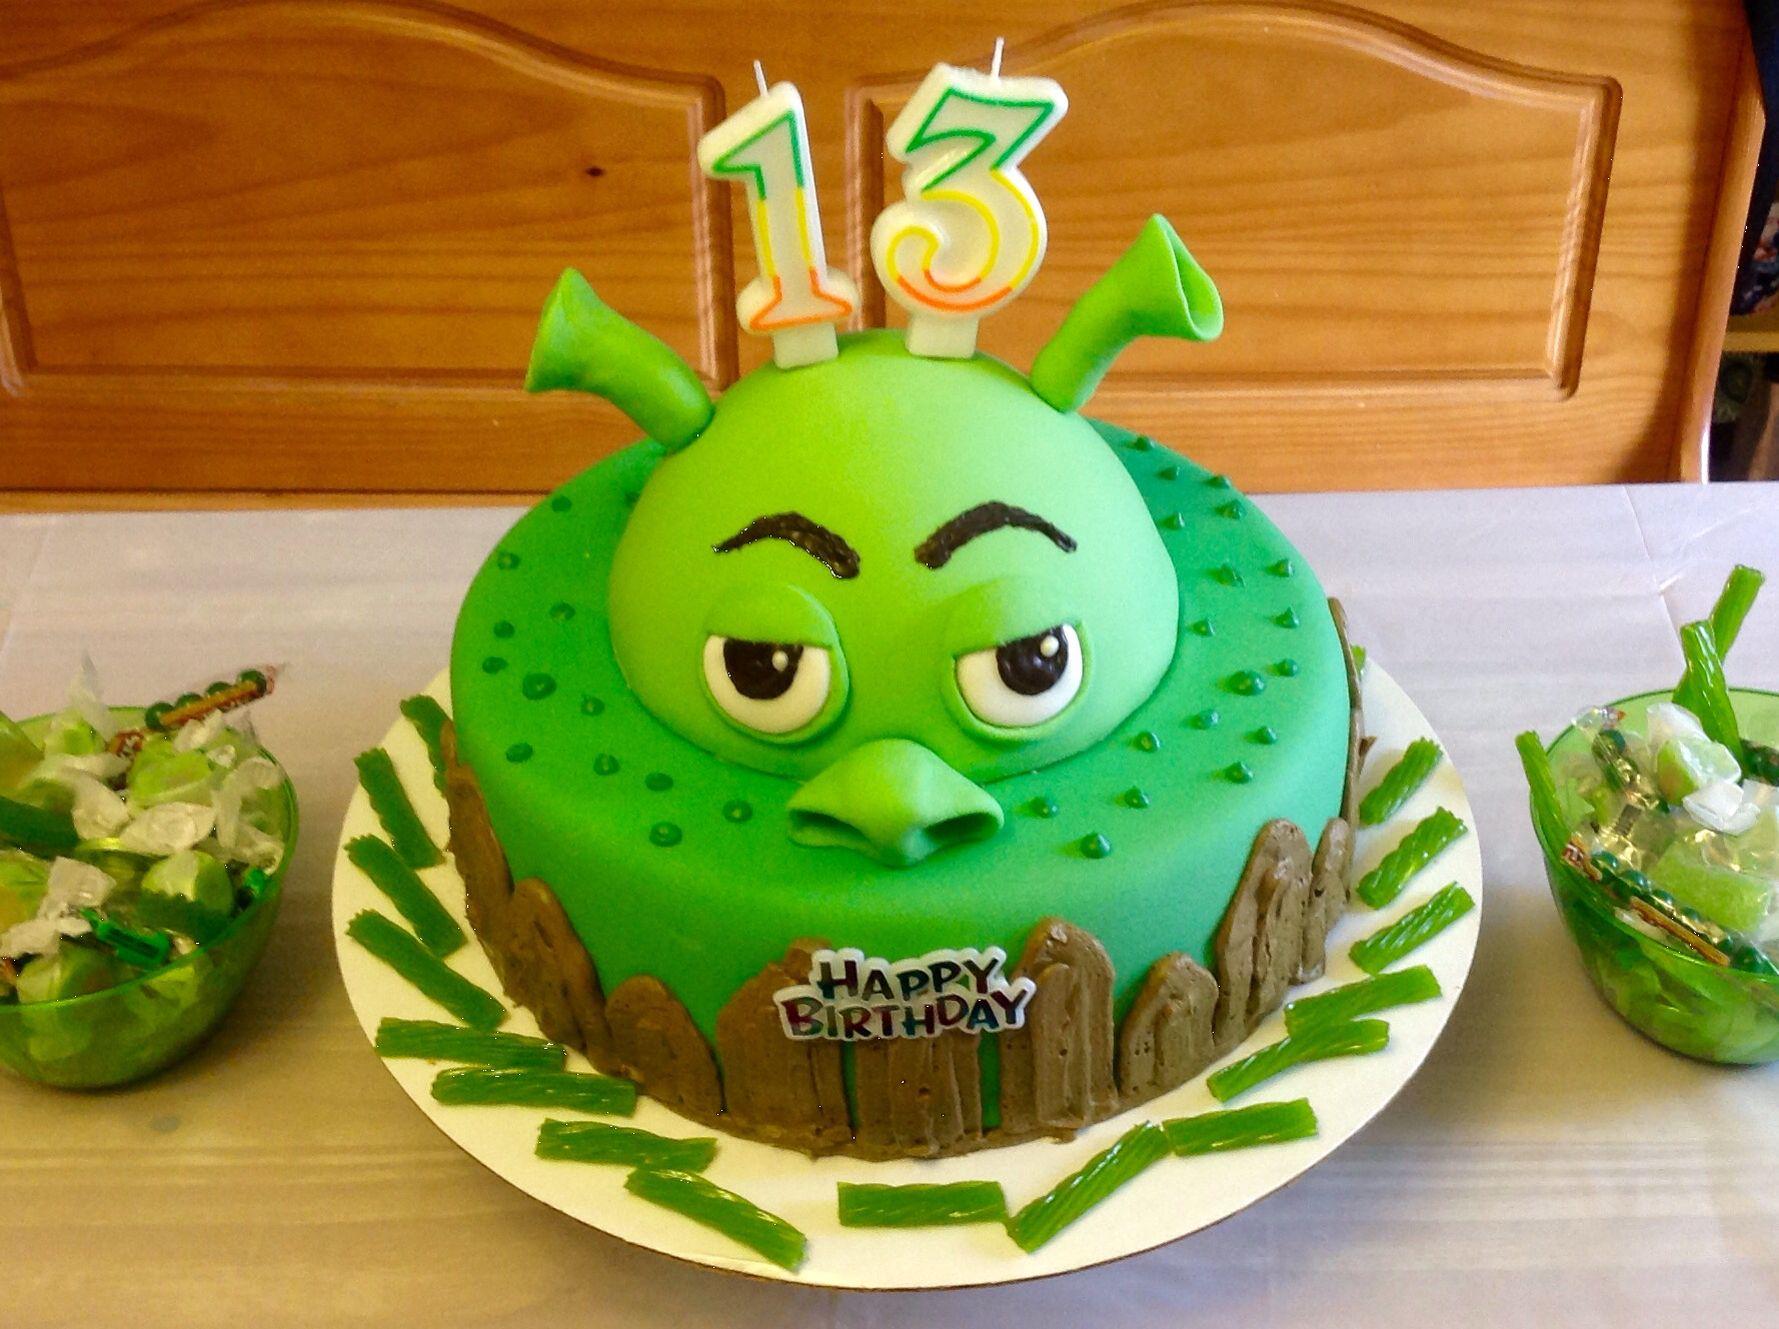 Pleasant Shrek In Swamp Birthday Cake With Images Shrek Cake Cake Funny Birthday Cards Online Benoljebrpdamsfinfo